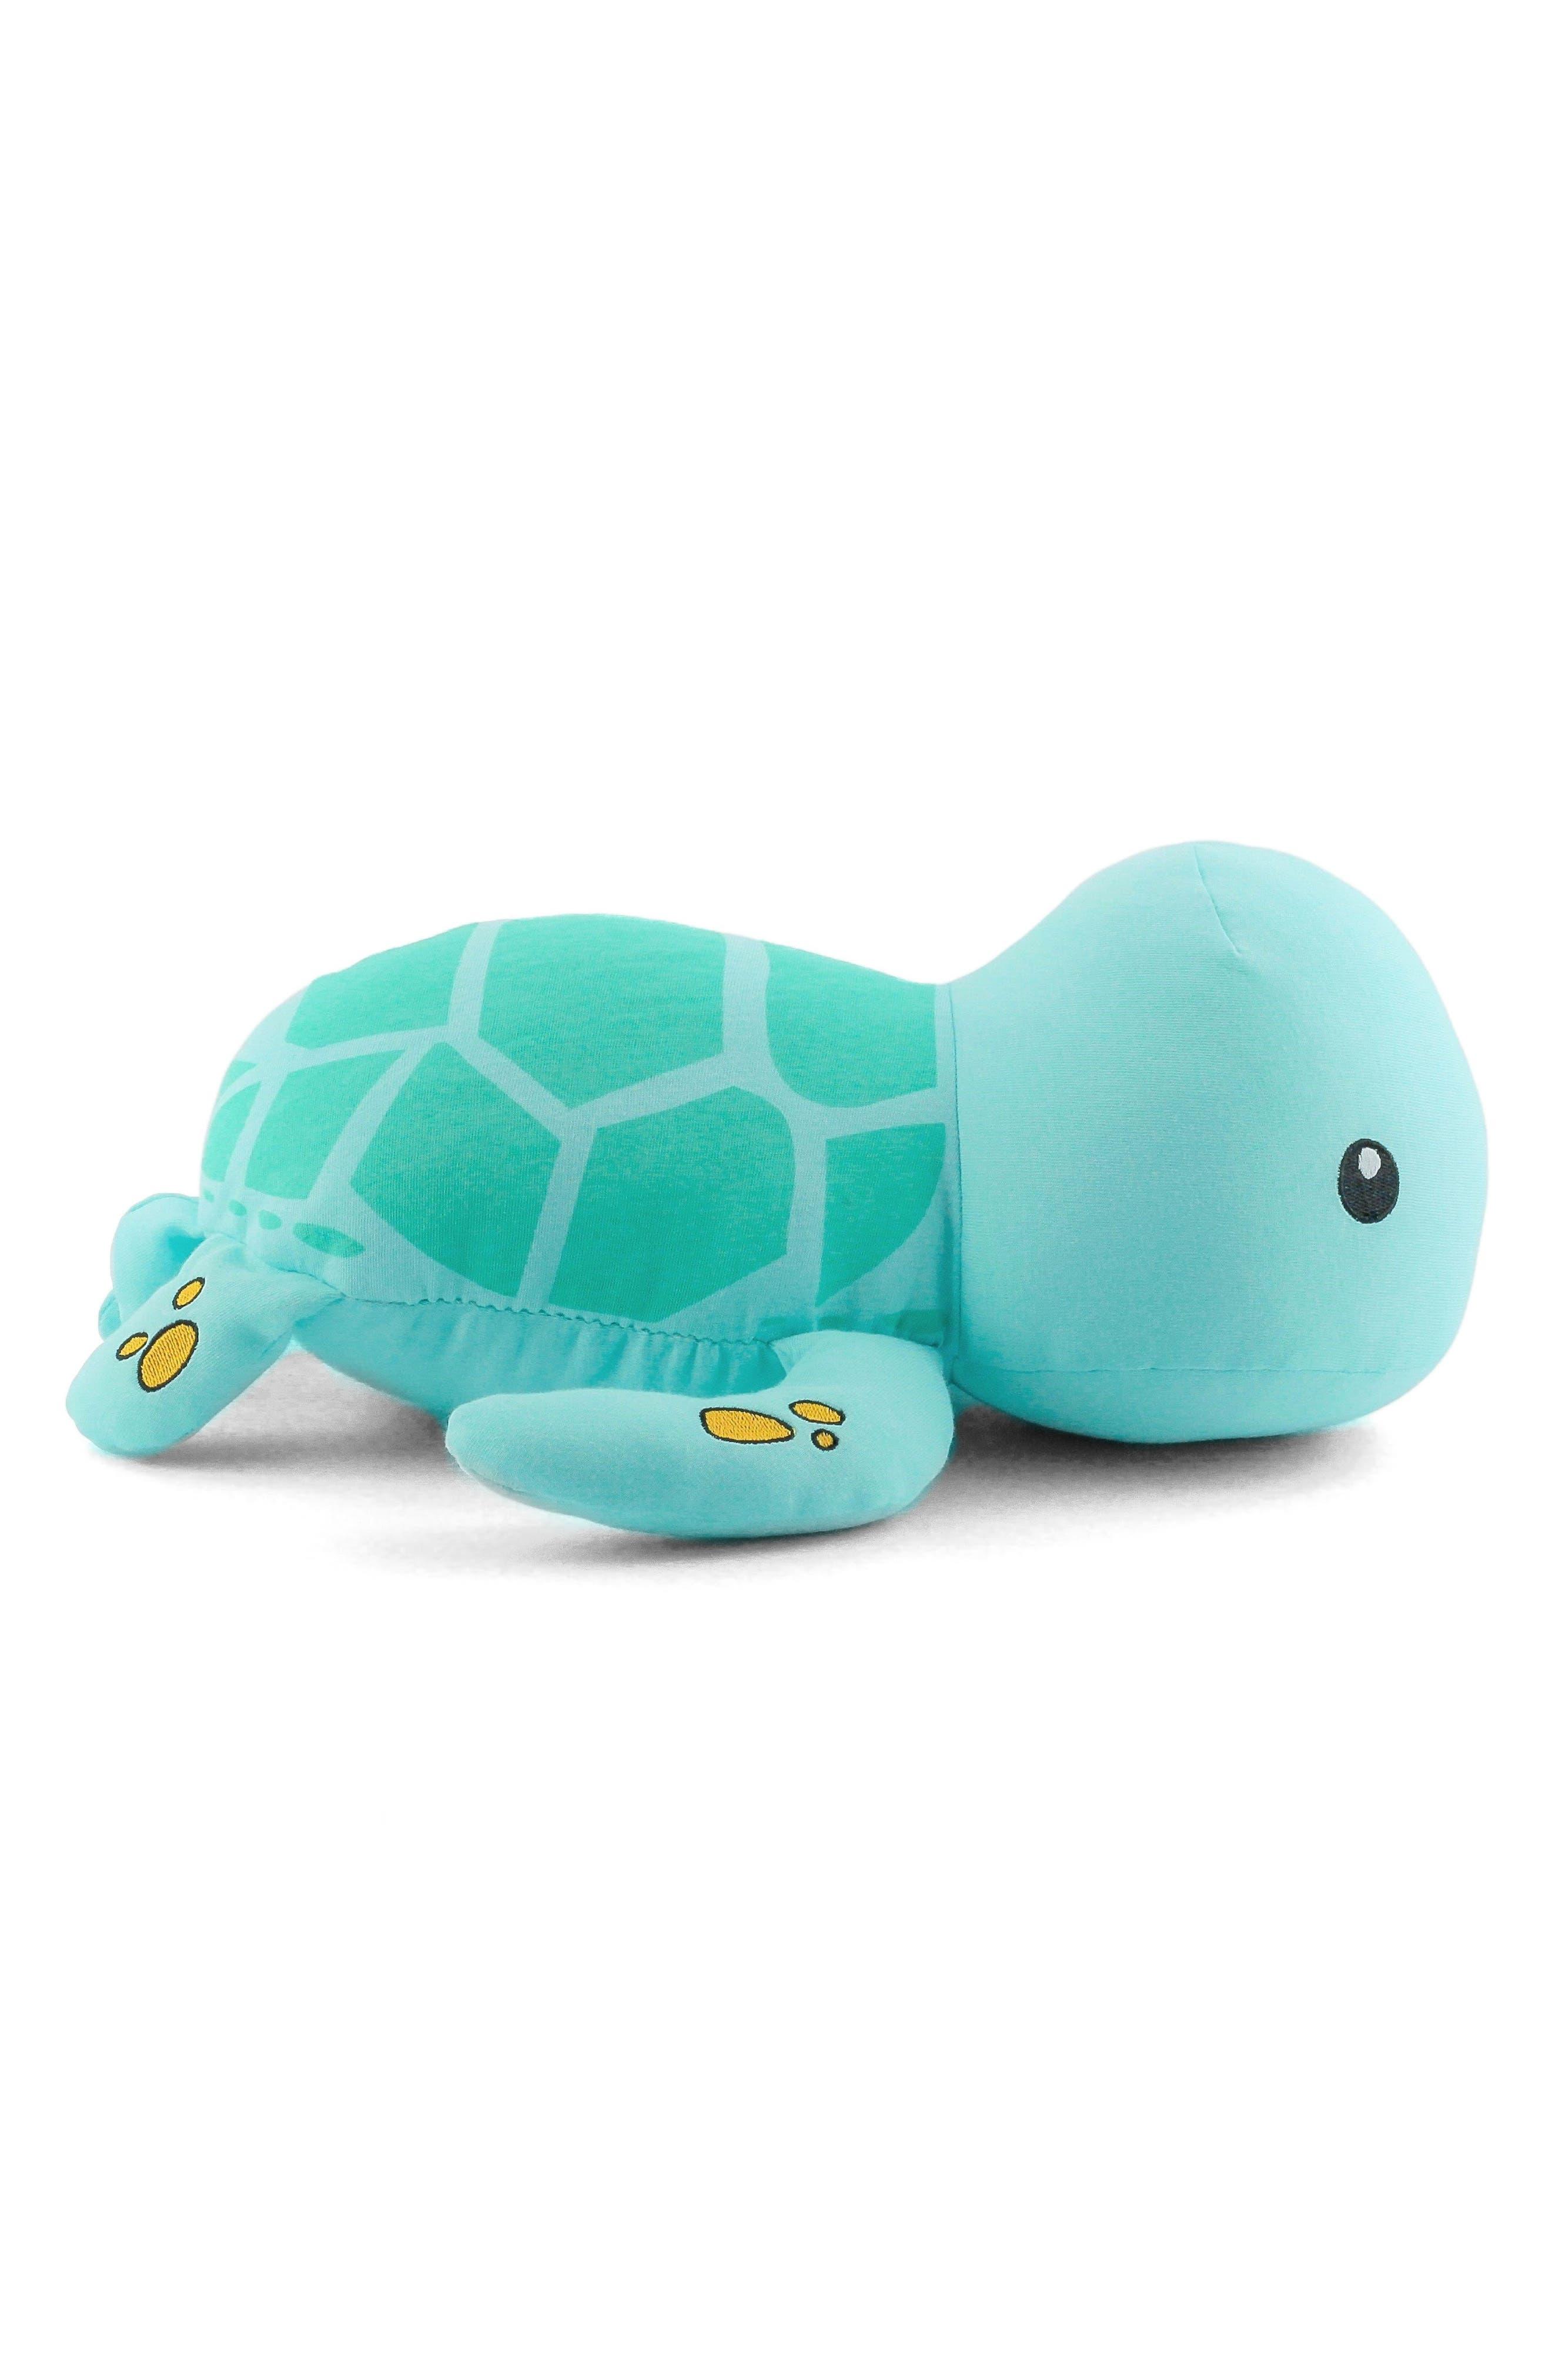 Tucker Turtle Stuffed Animal,                         Main,                         color, Blue/ Green